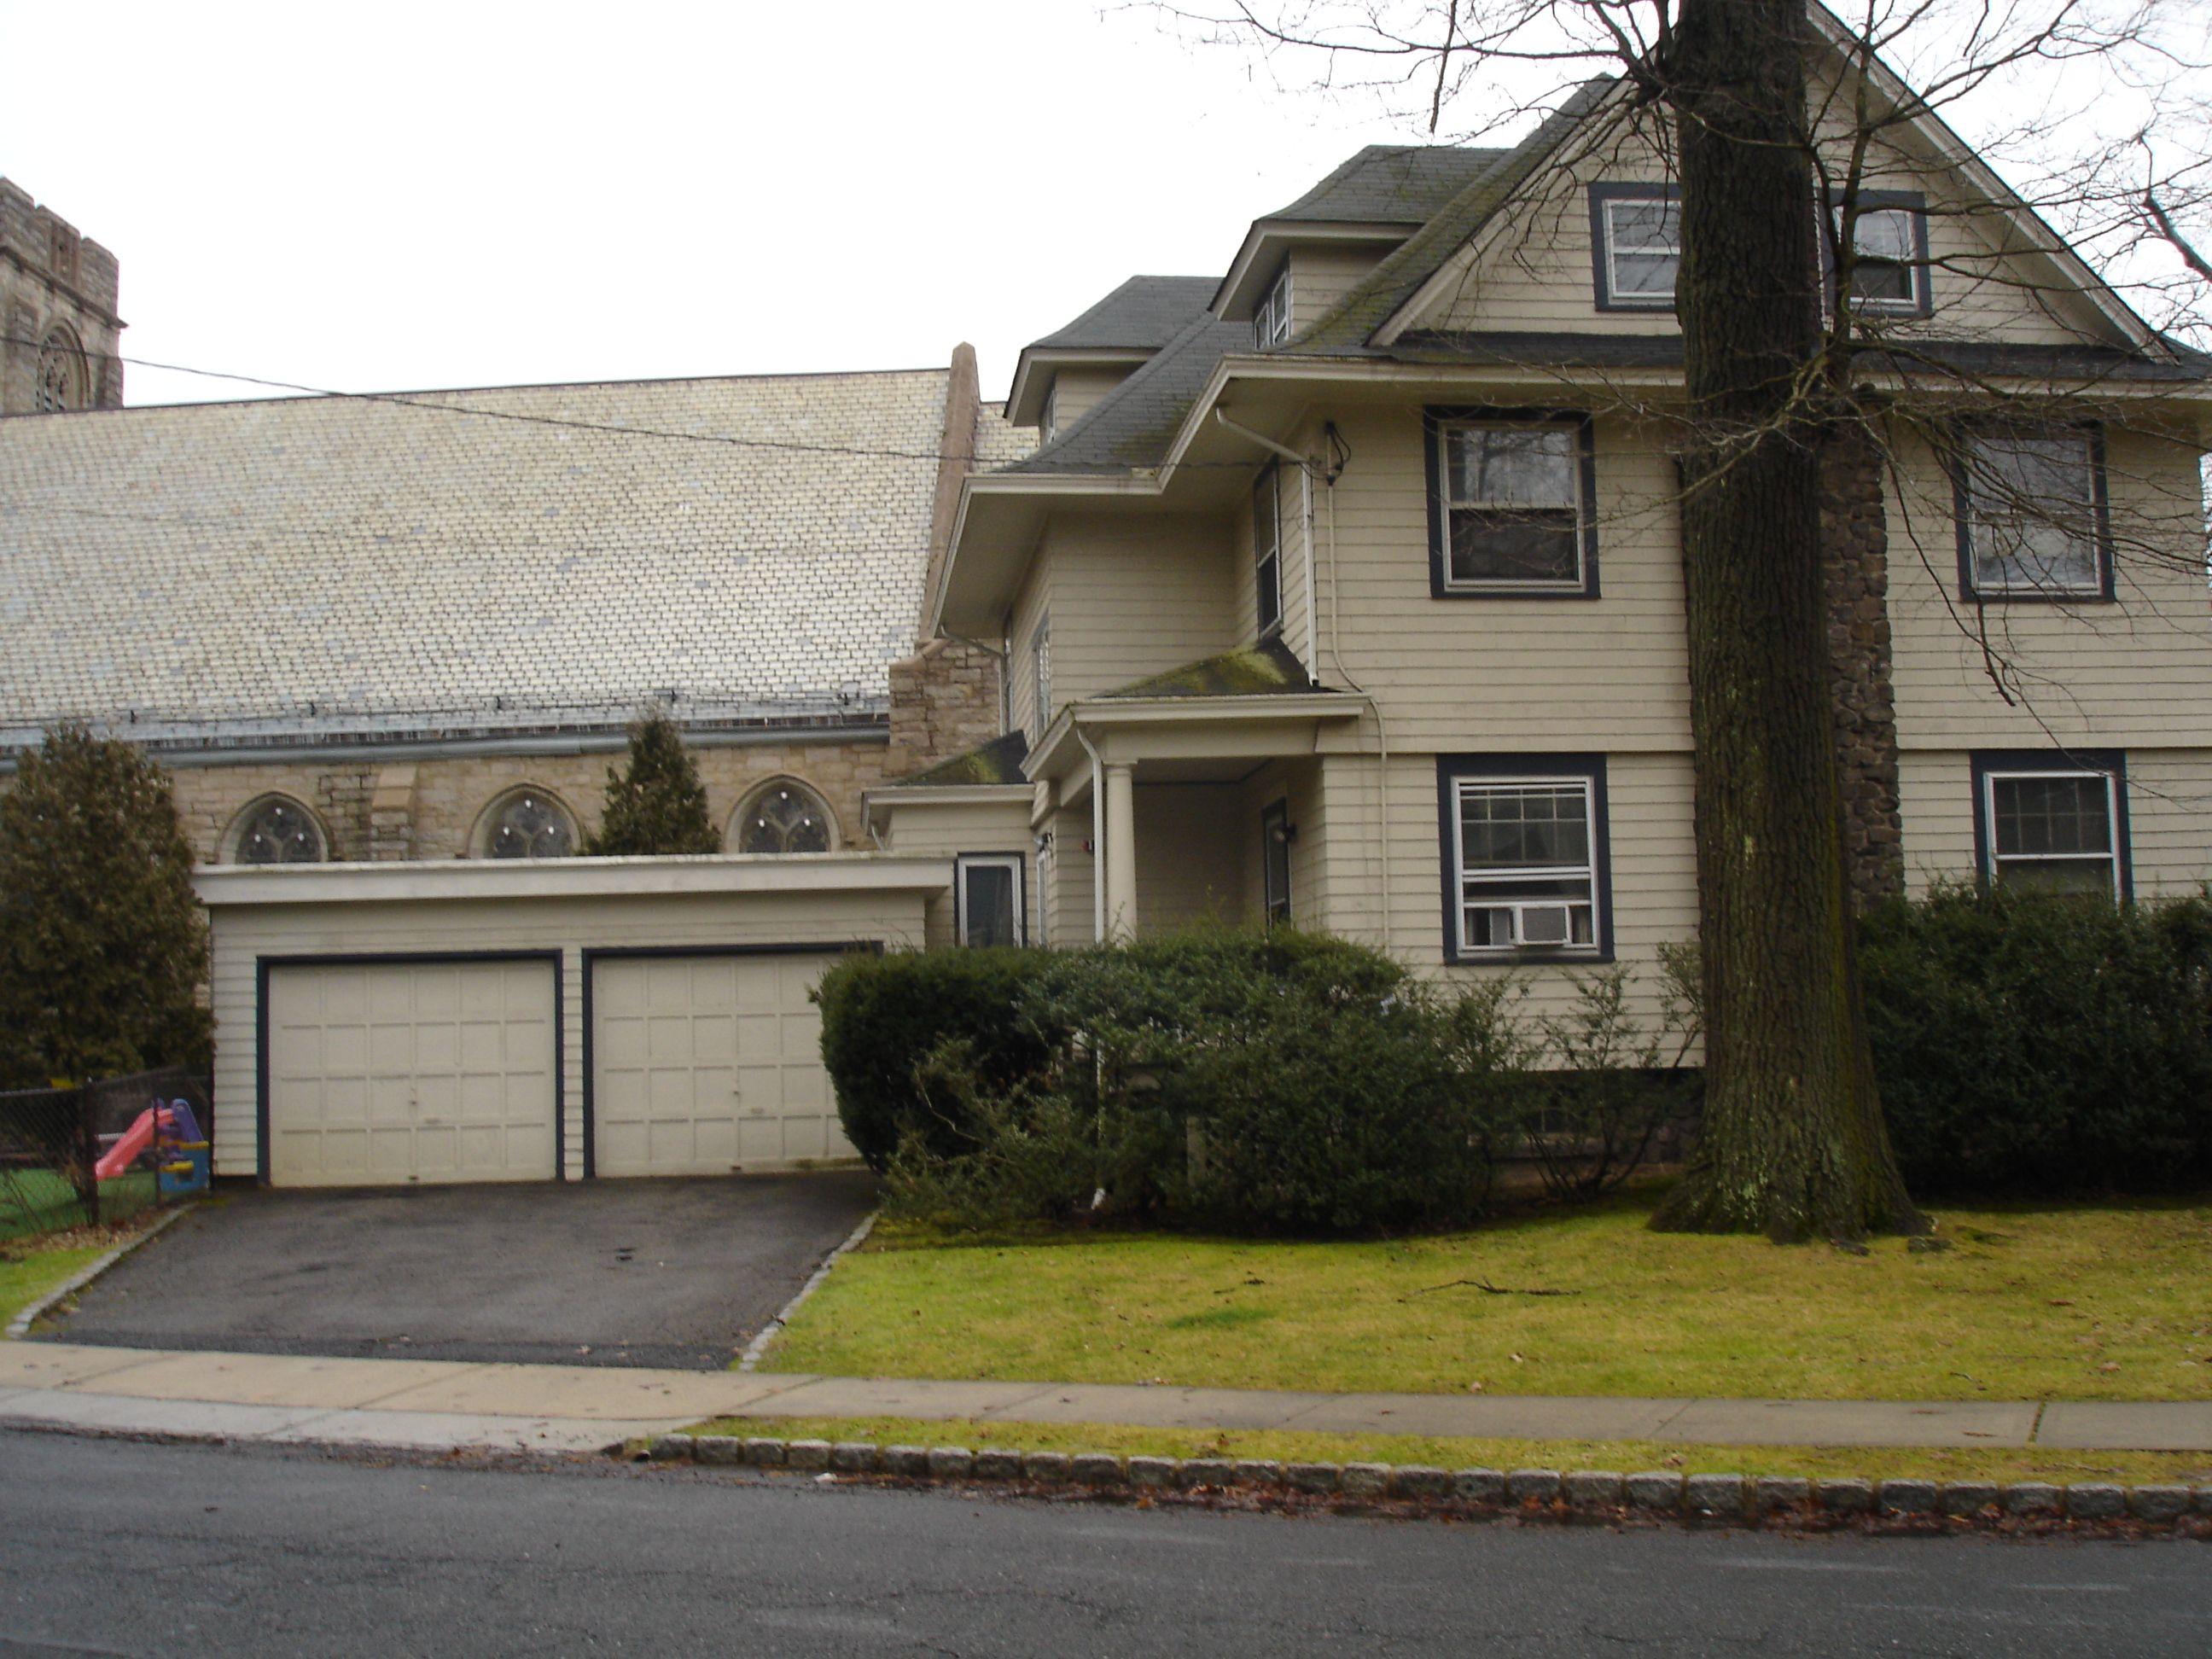 Upper Montclair, NJ HOME FOR RENT 2,250.00 per month